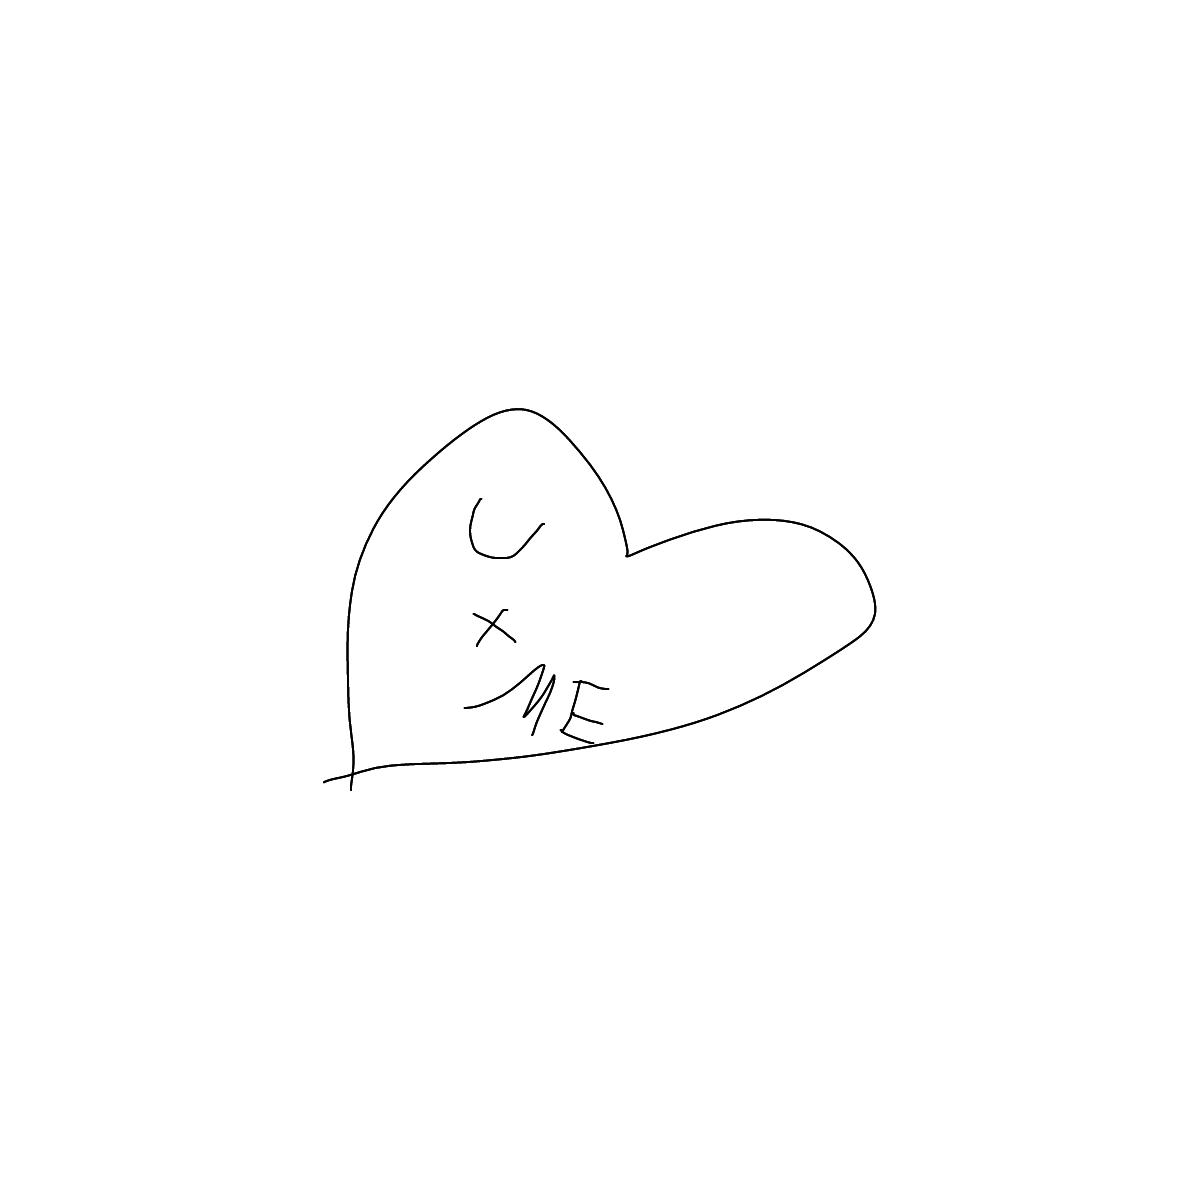 BAAAM drawing#216 lat:44.2835769653320300lng: -88.3836517333984400